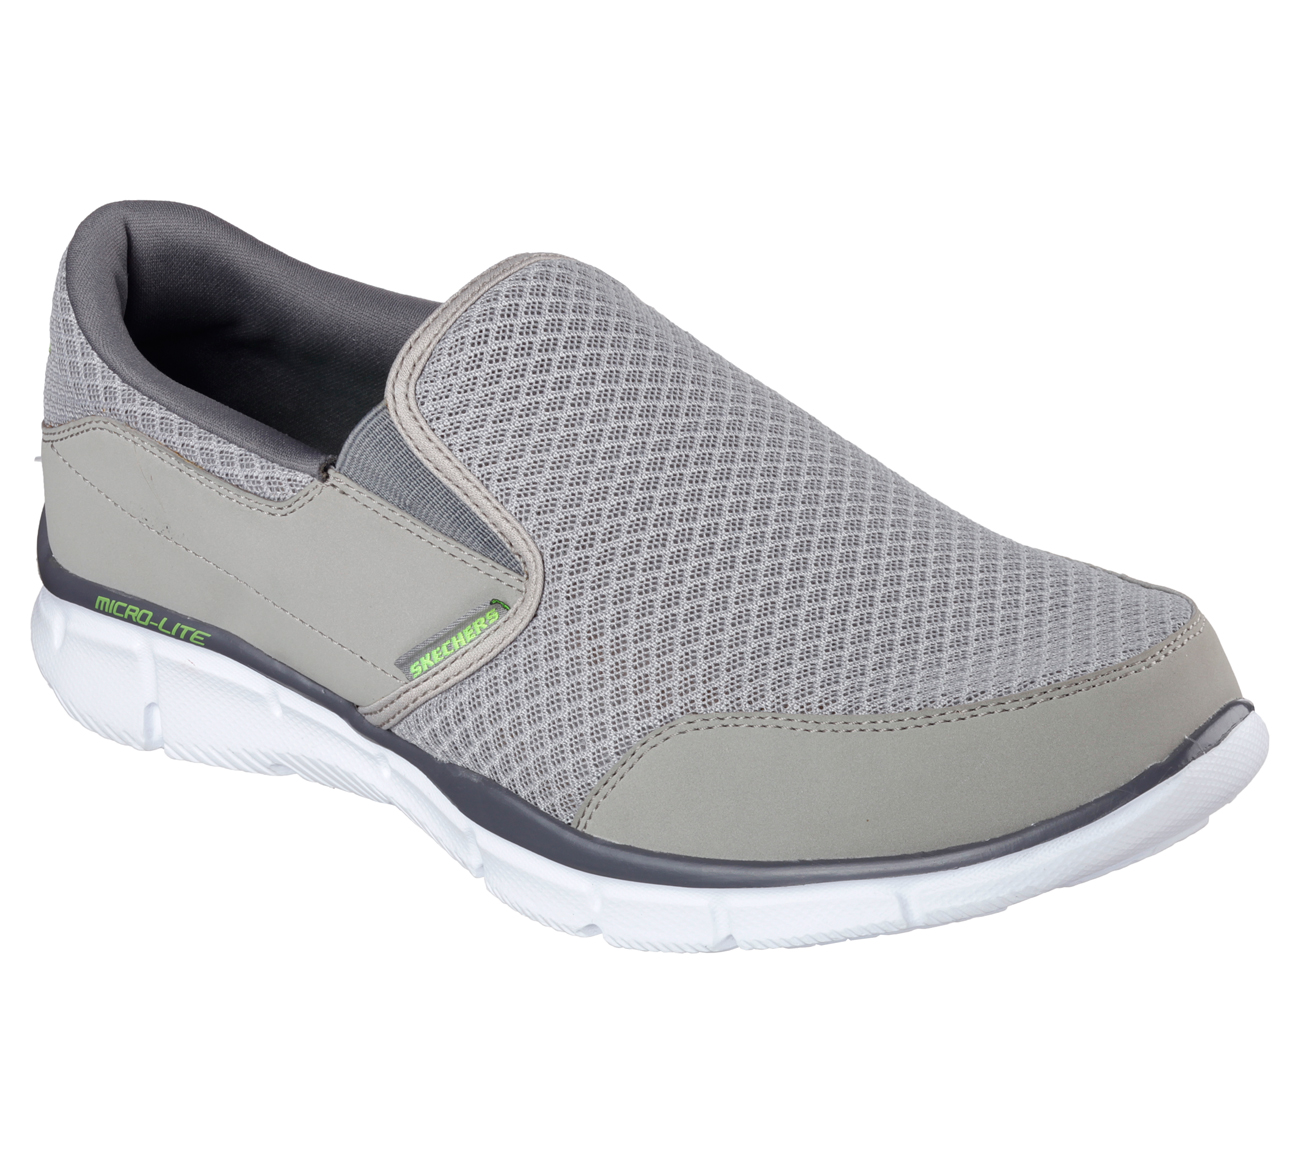 Skechers Shape Ups for Women | eBay